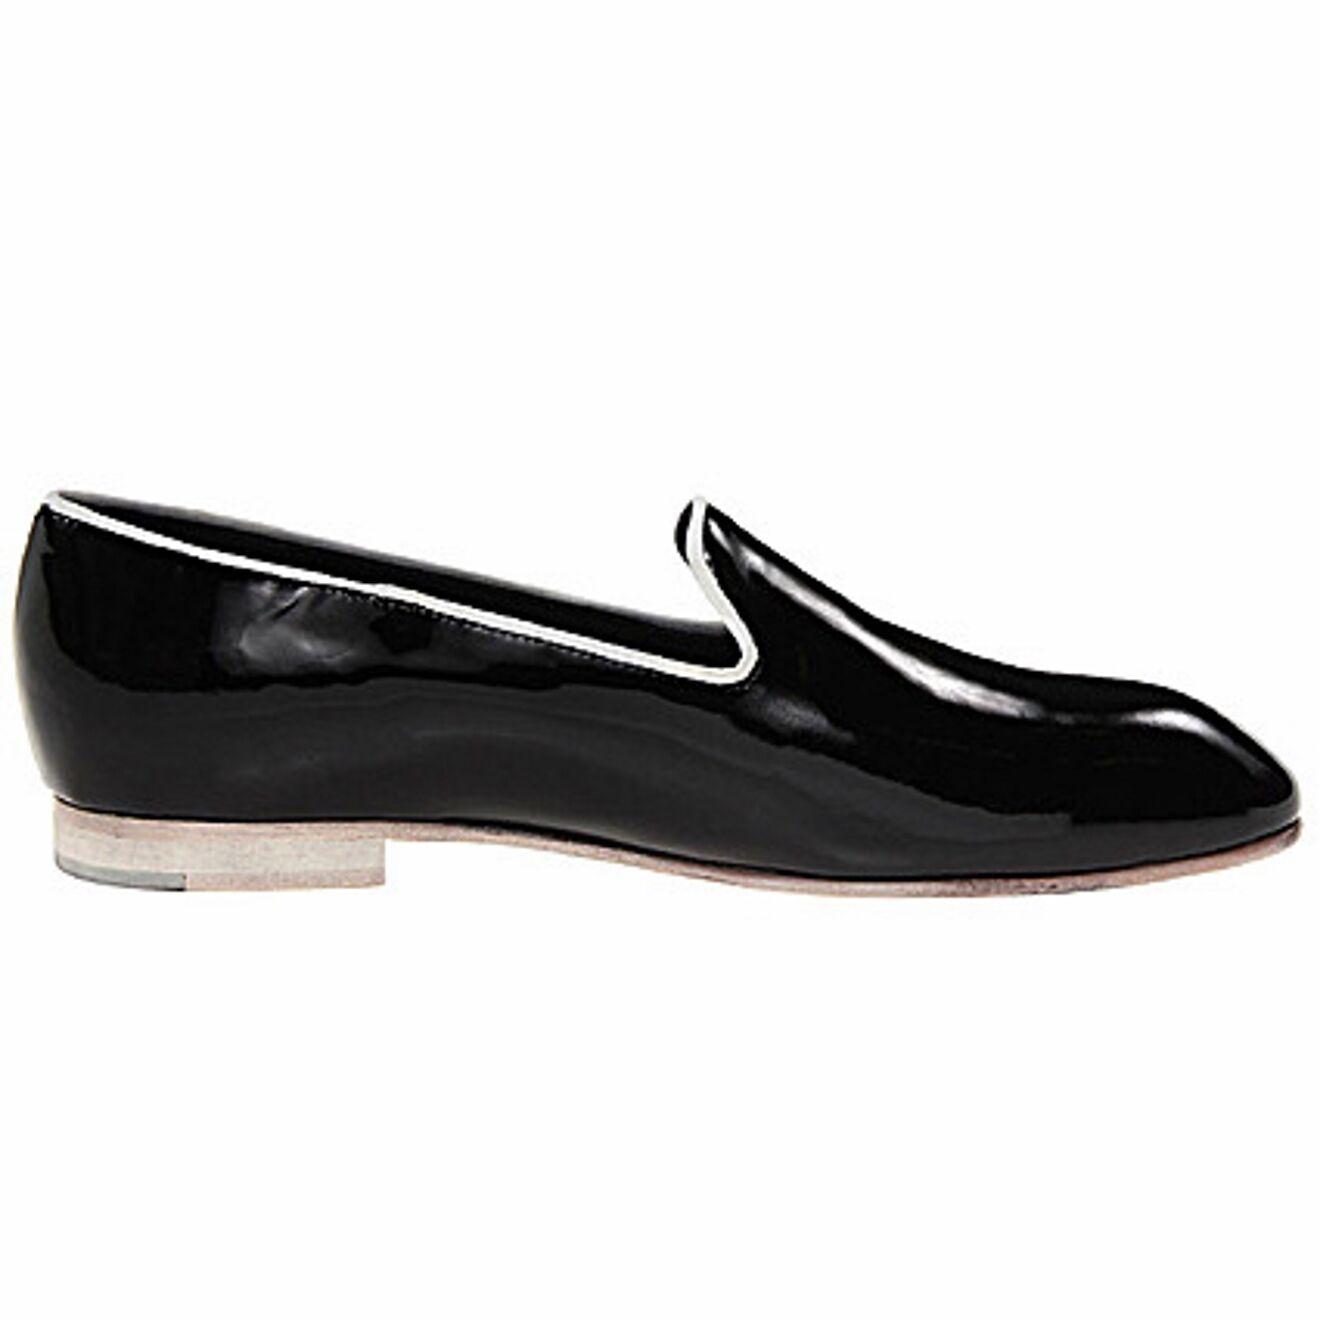 Paul Smith Mocassino, Baldwin patent loafers mocassin